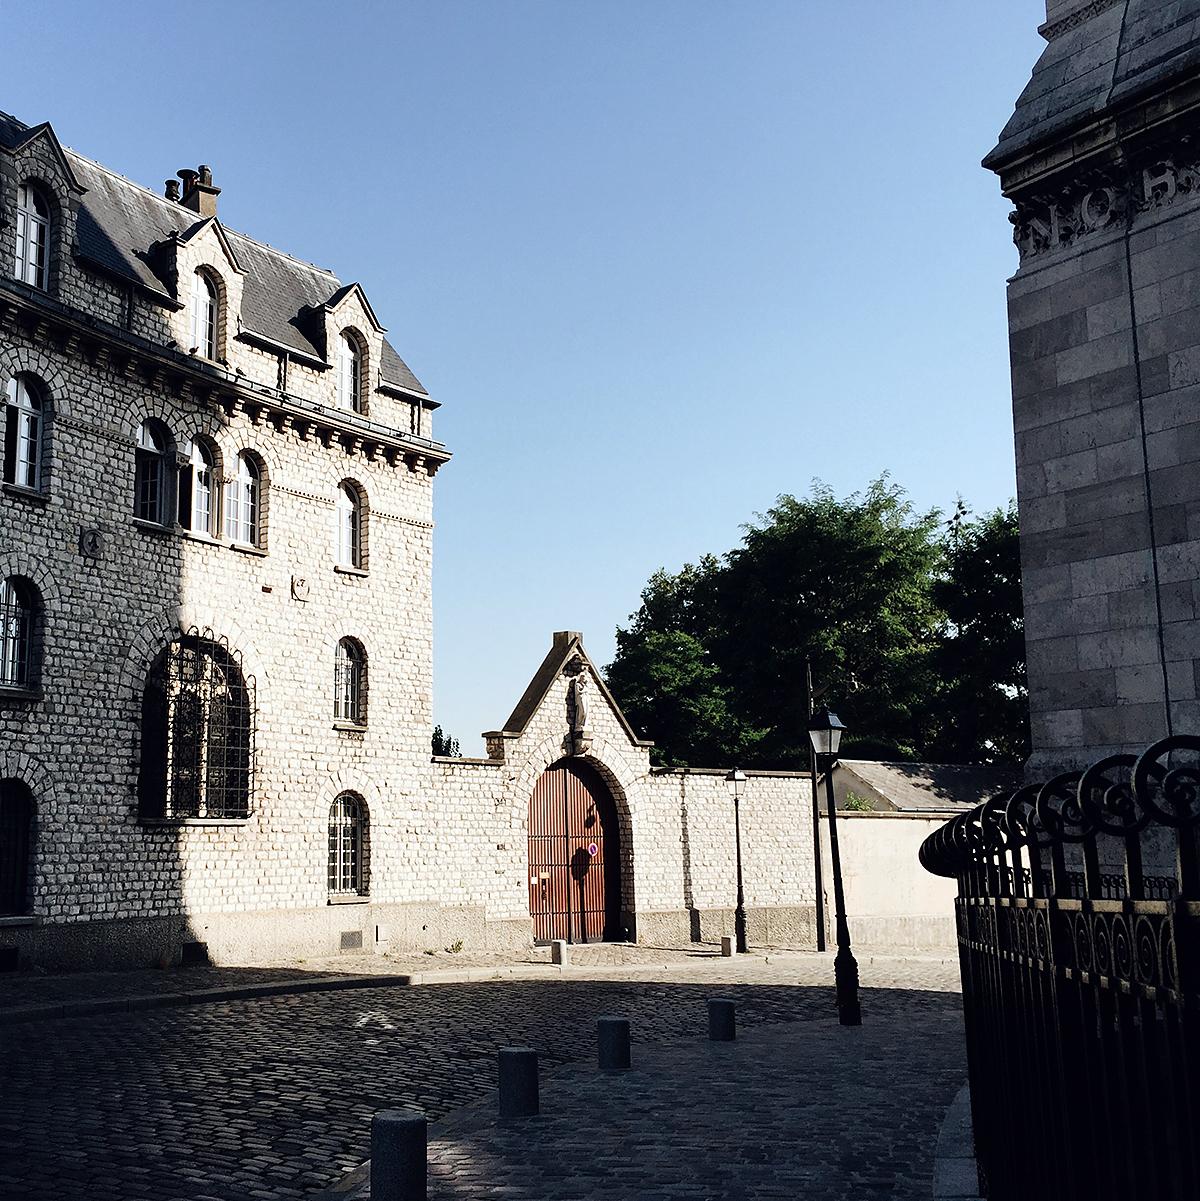 The roads around Sacré-Coeur